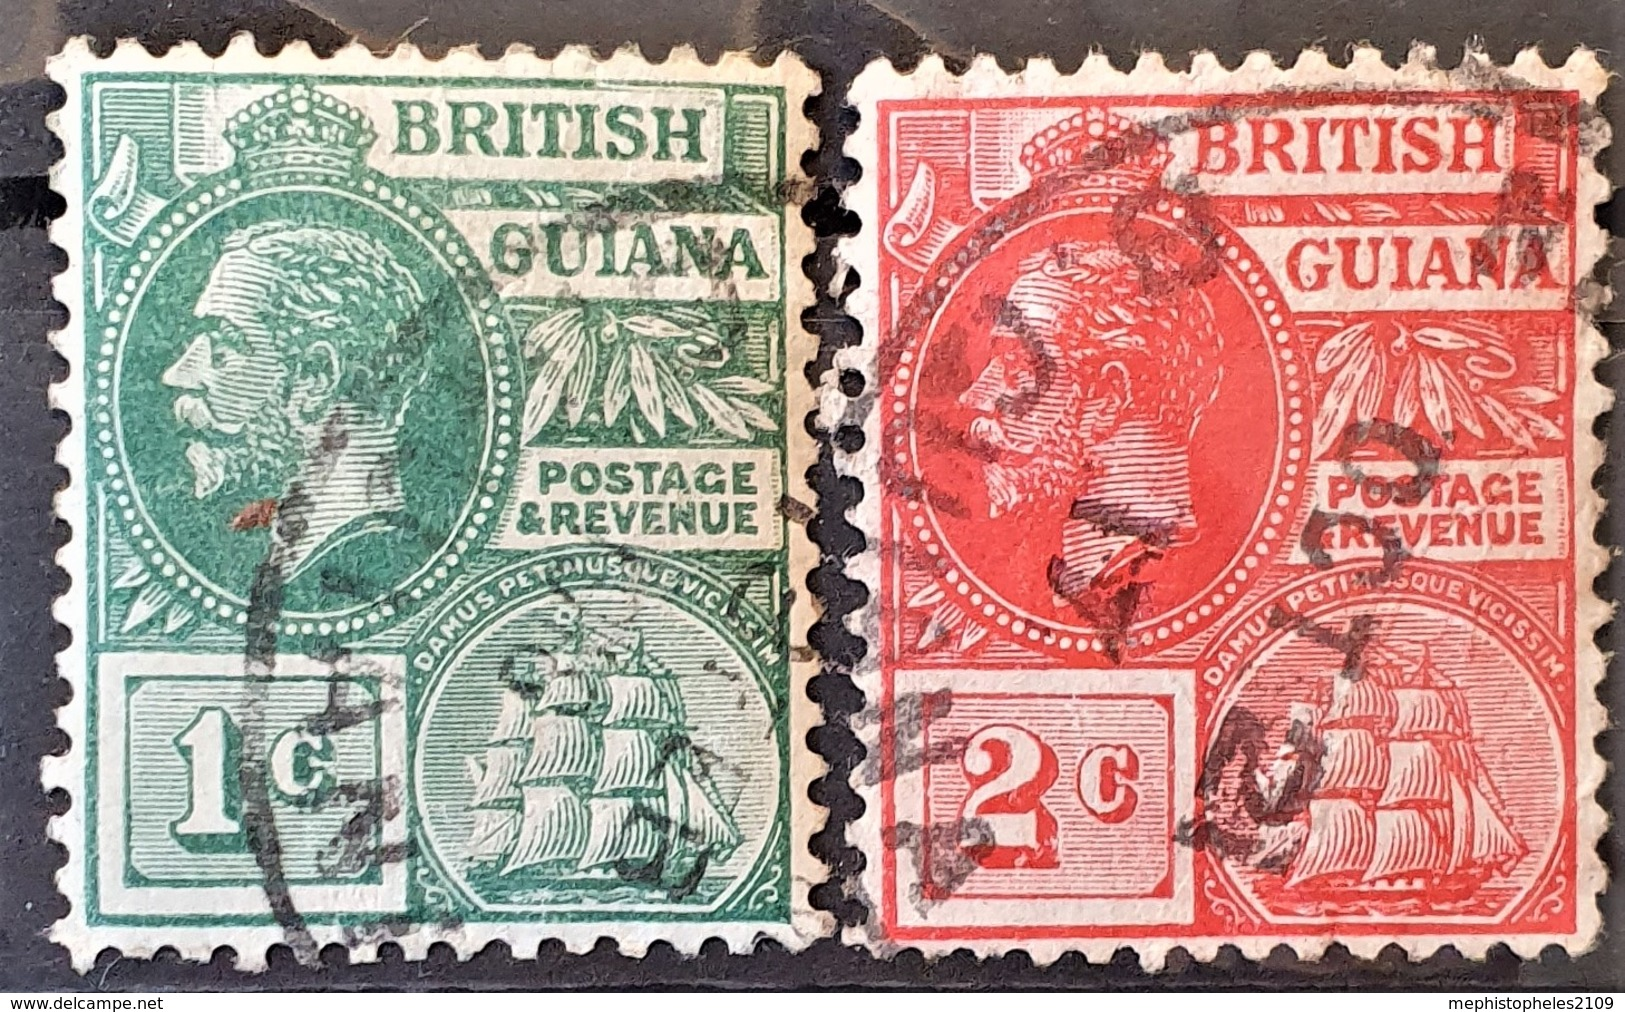 BRITISH GUIANA 1913-1917 - Canceled - Sc# 178, 179 - British Guiana (...-1966)